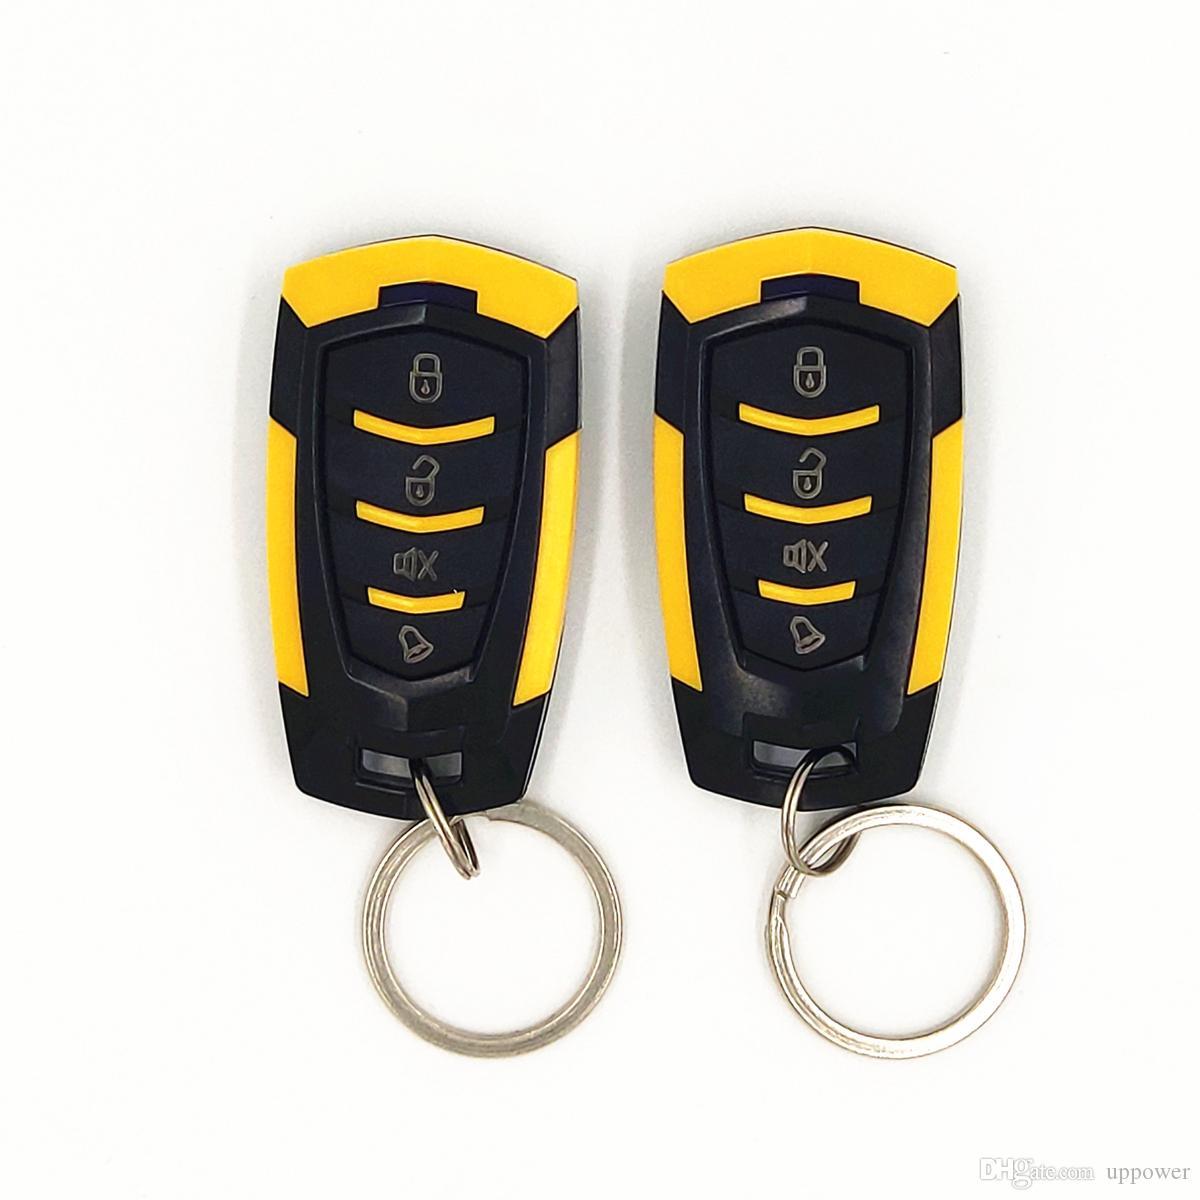 CarBest L218car alarm 3-Channel 1-Way Car Alarm Vehicle Security Keyless Entry System